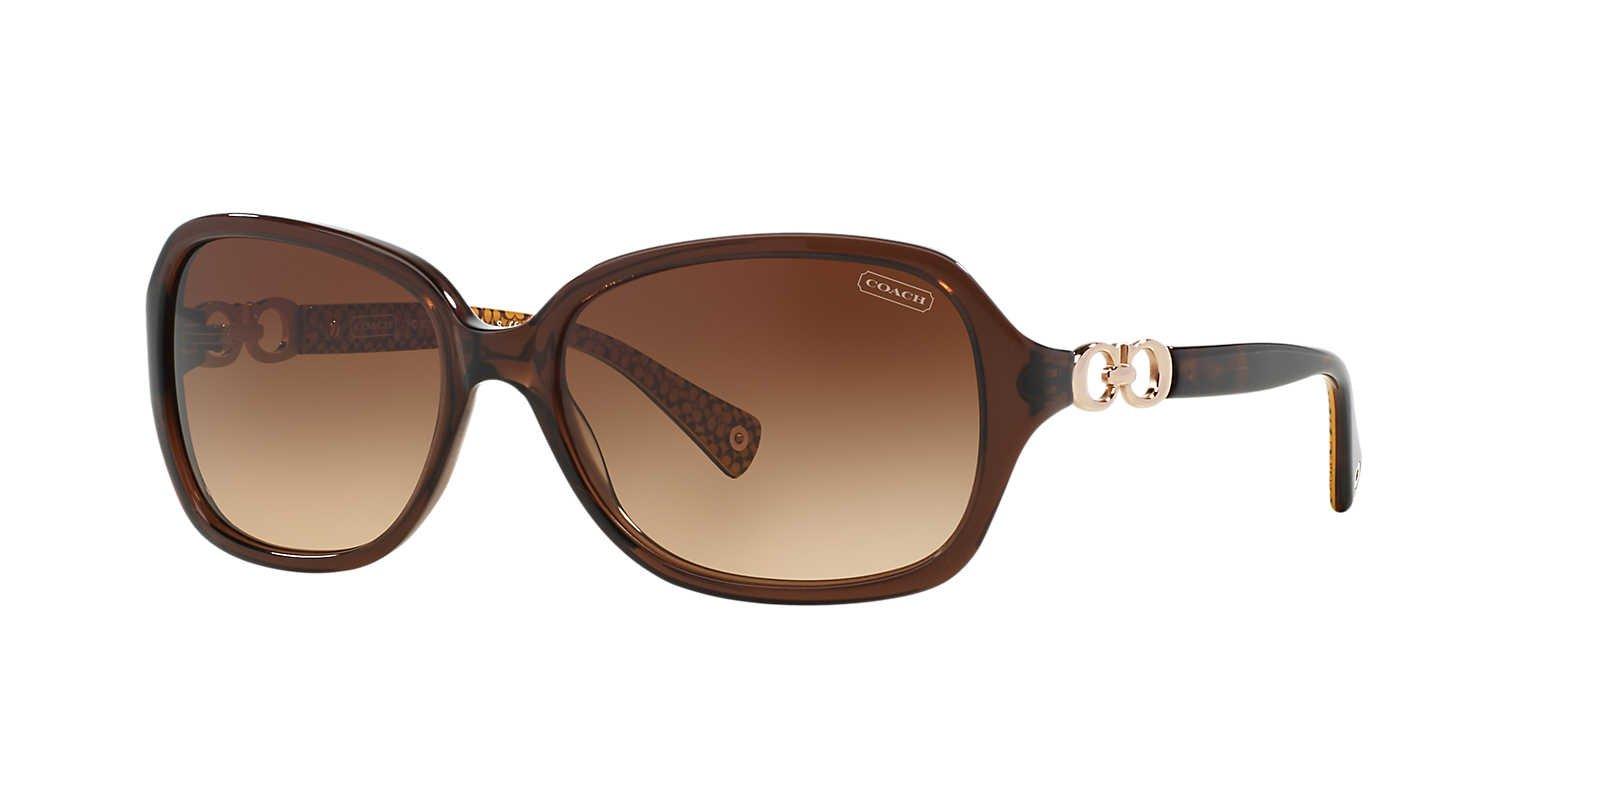 Coach Women 1099081002 Brown/Brown Sunglasses 58mm